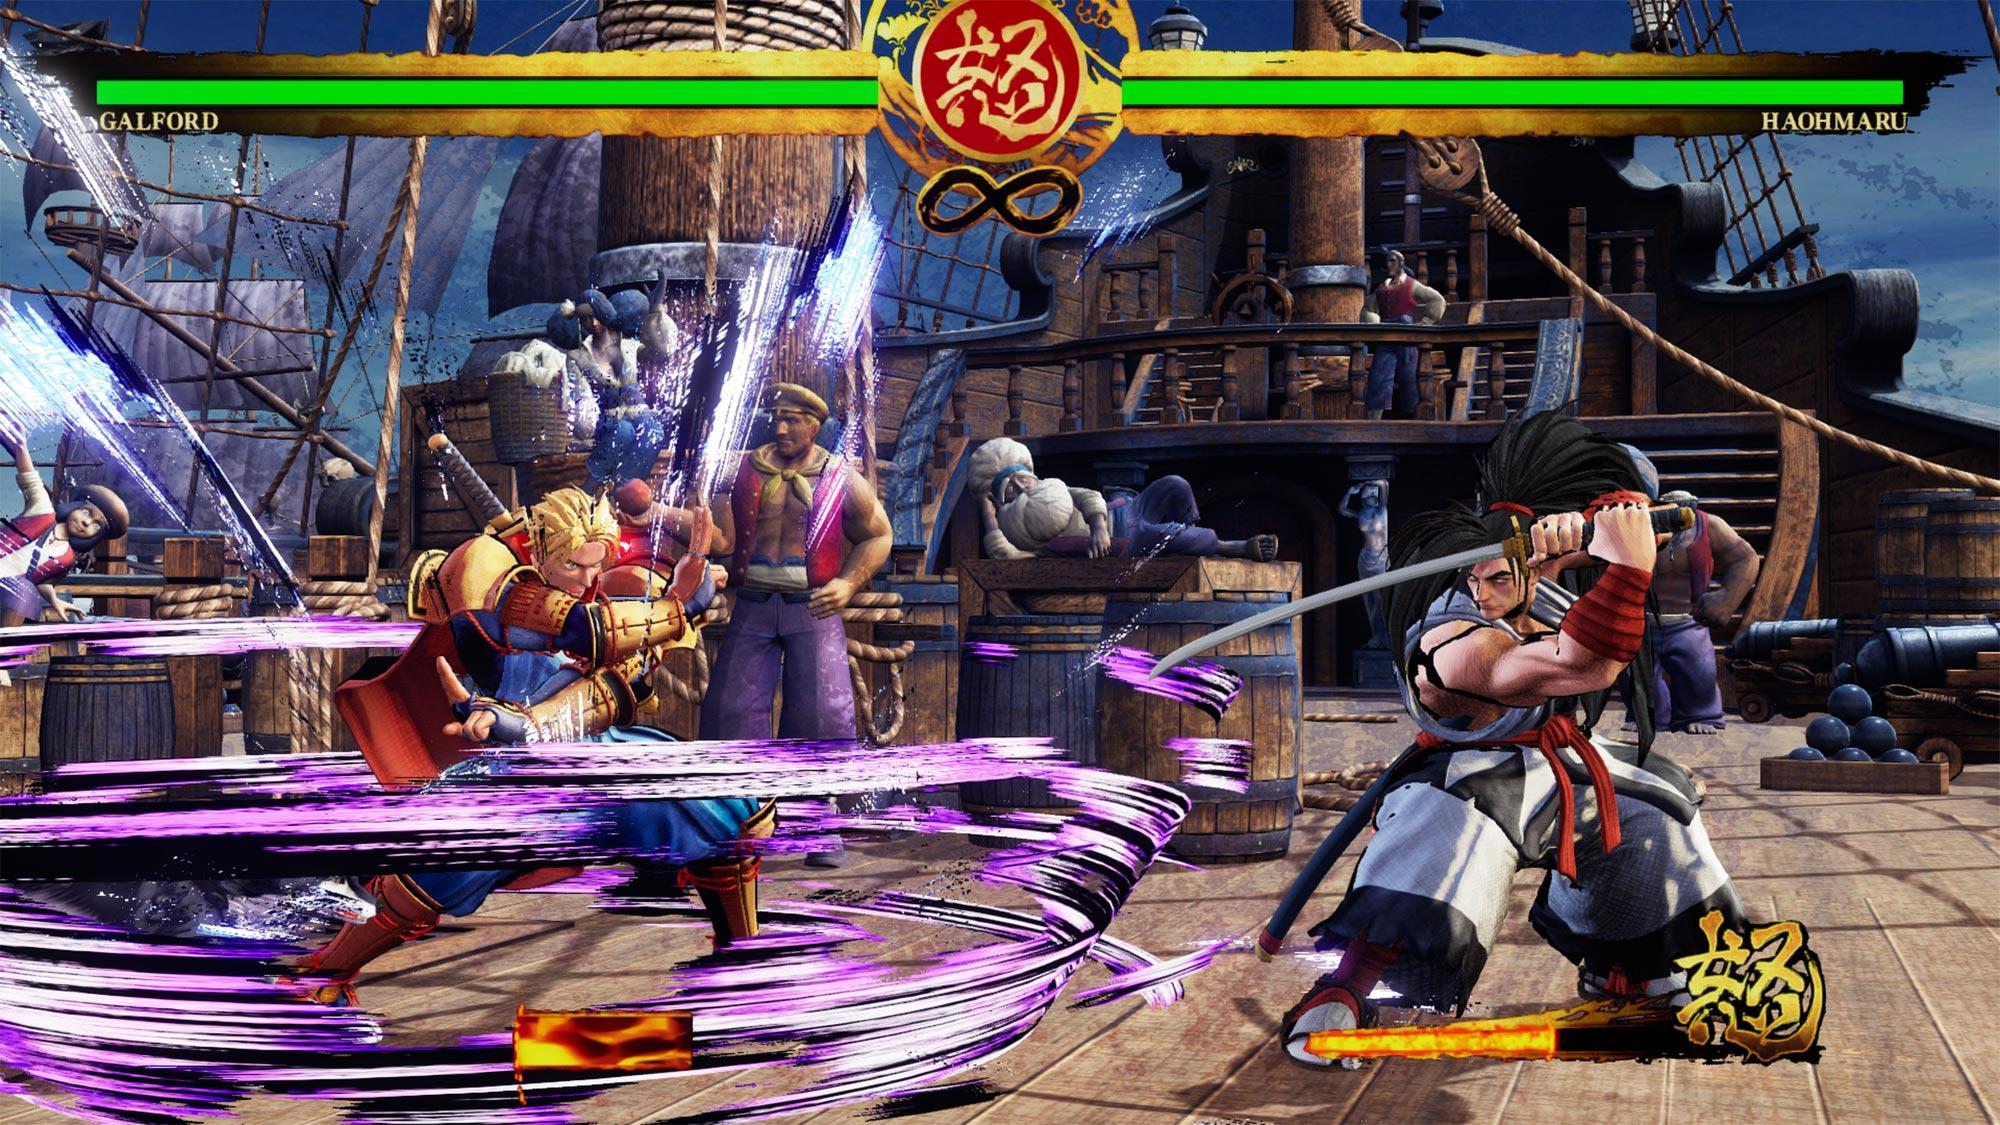 Samurai Shodown screenshots 9 out of 11 image gallery